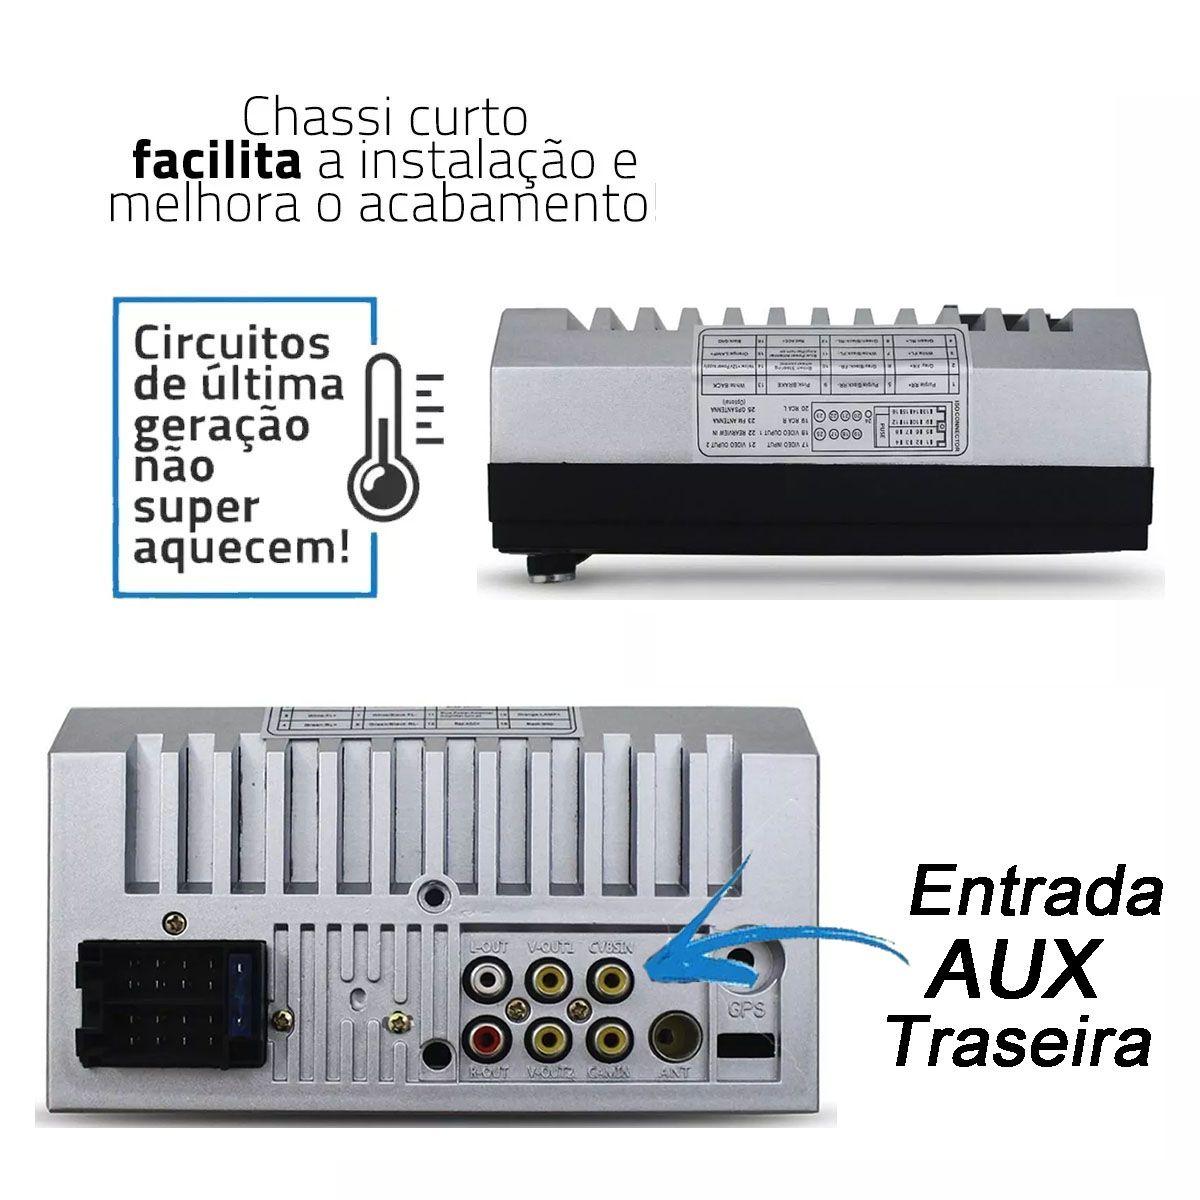 Central Multimídia Hyundai First Option 7 Polegadas + Moldura Creta Preto 2 Din Poliparts